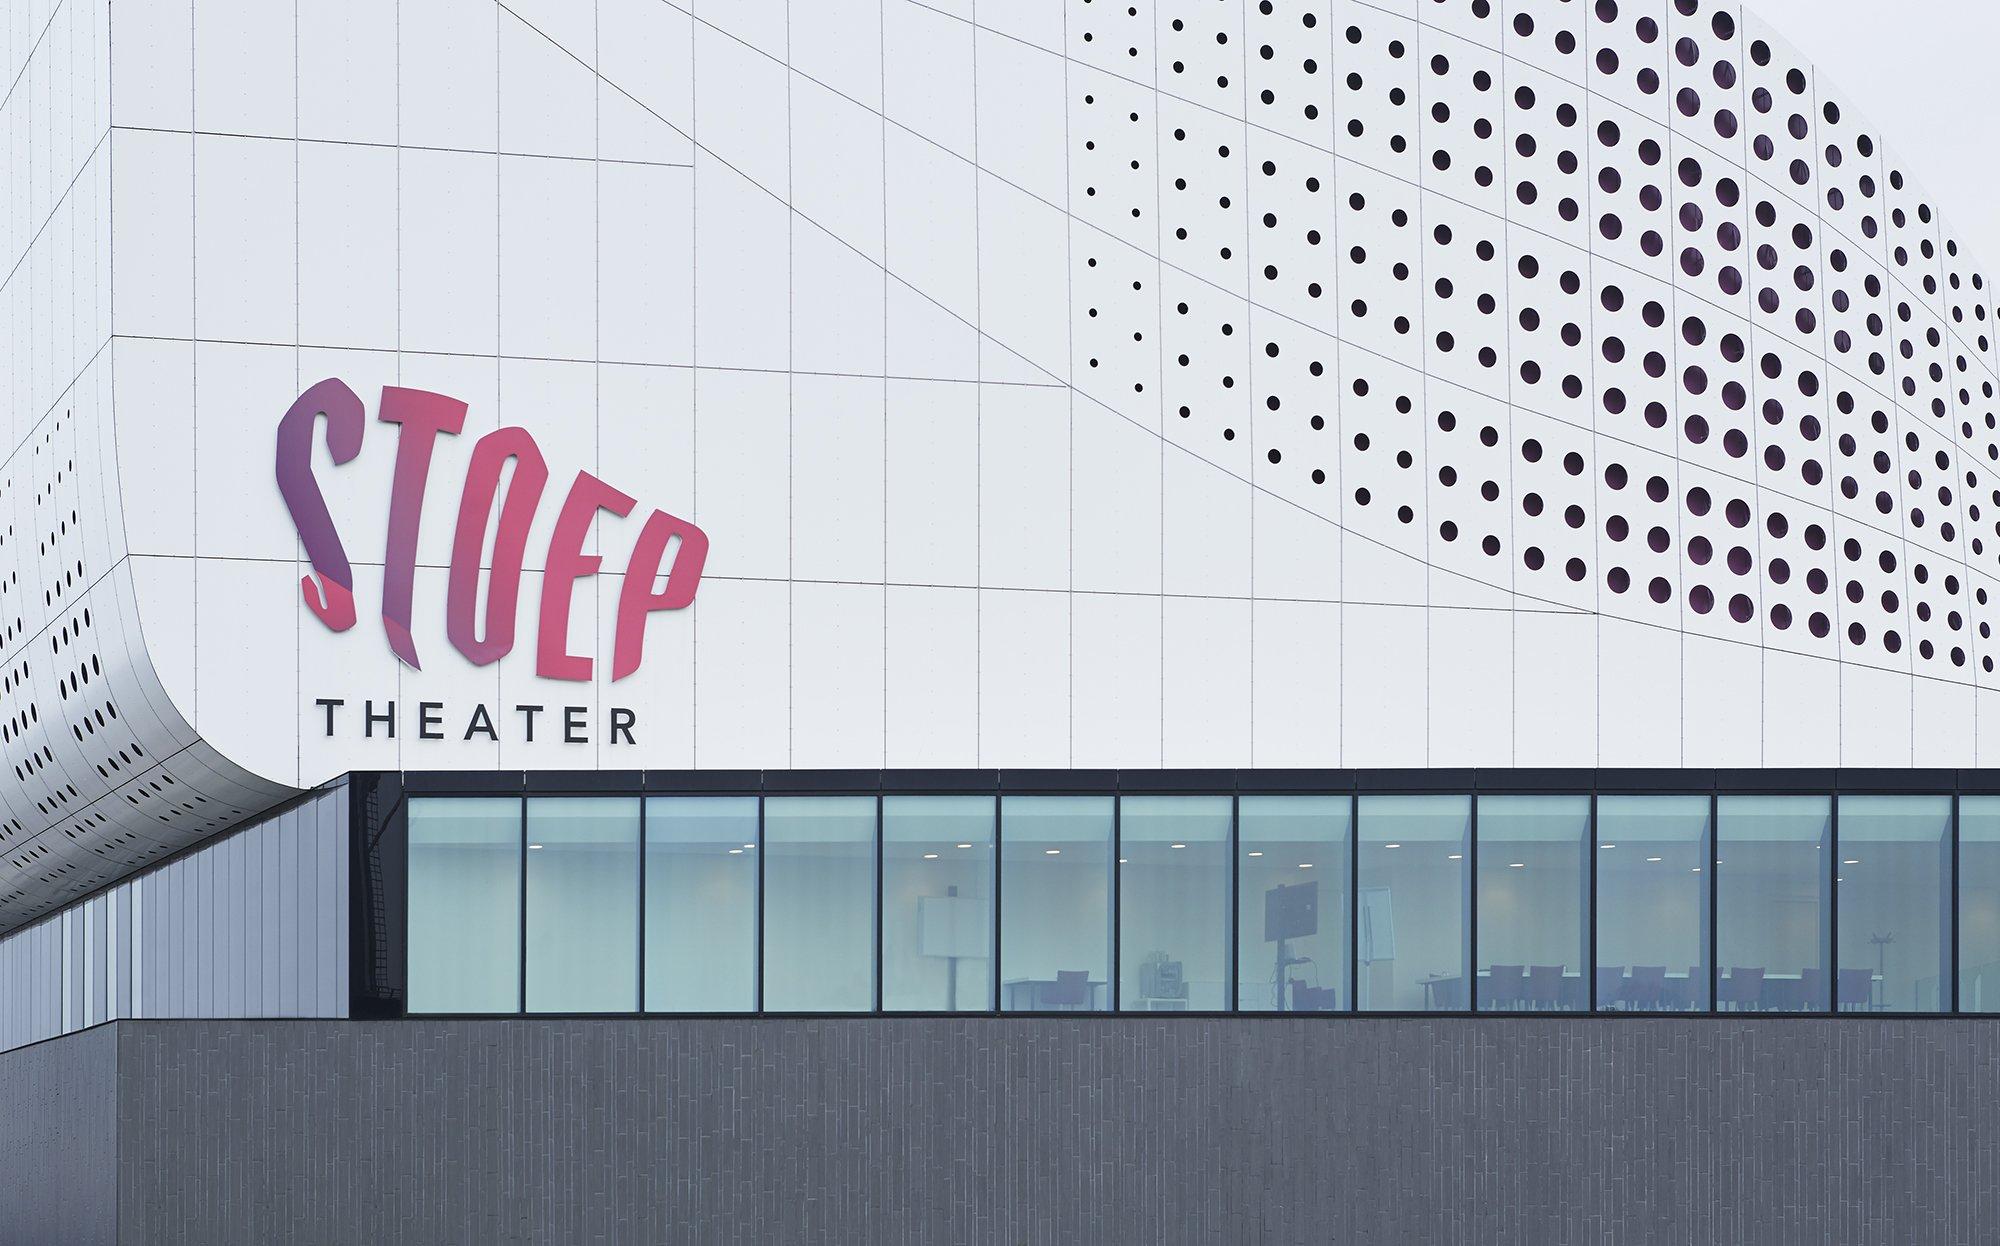 Theater De Stoep